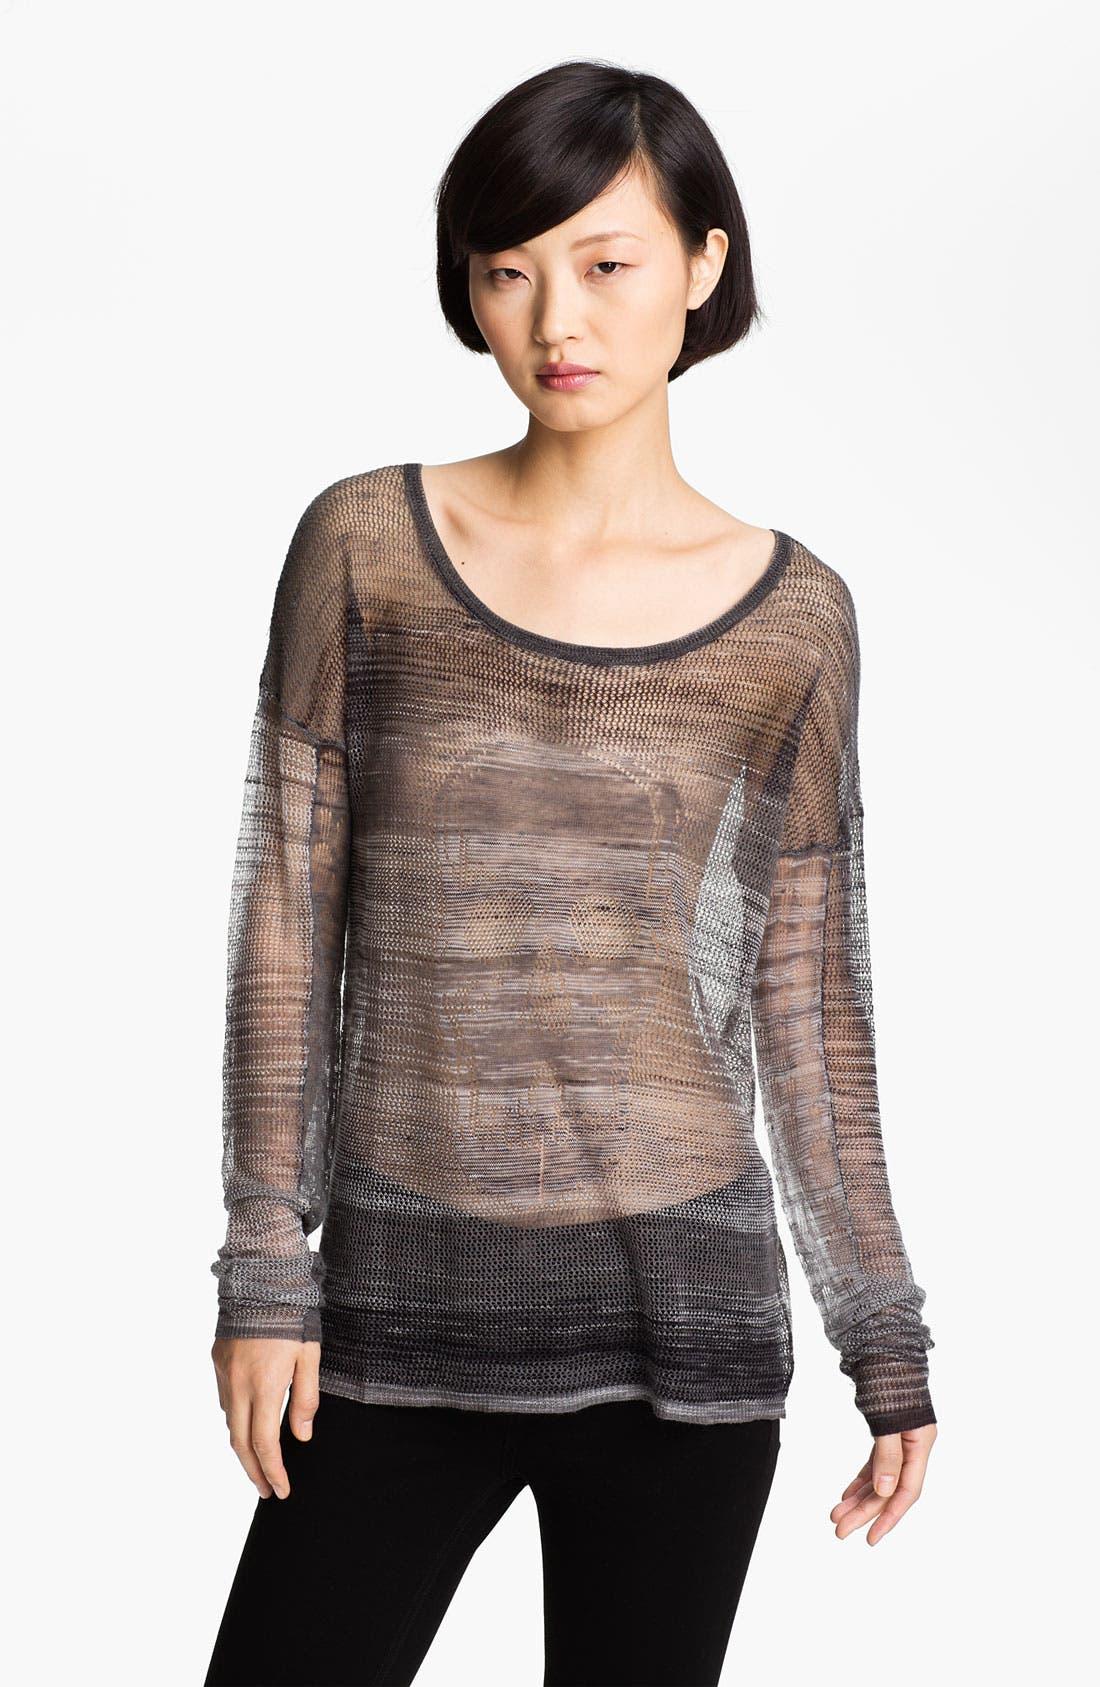 Main Image - Zadig & Voltaire 'Box' Sheer Sweater